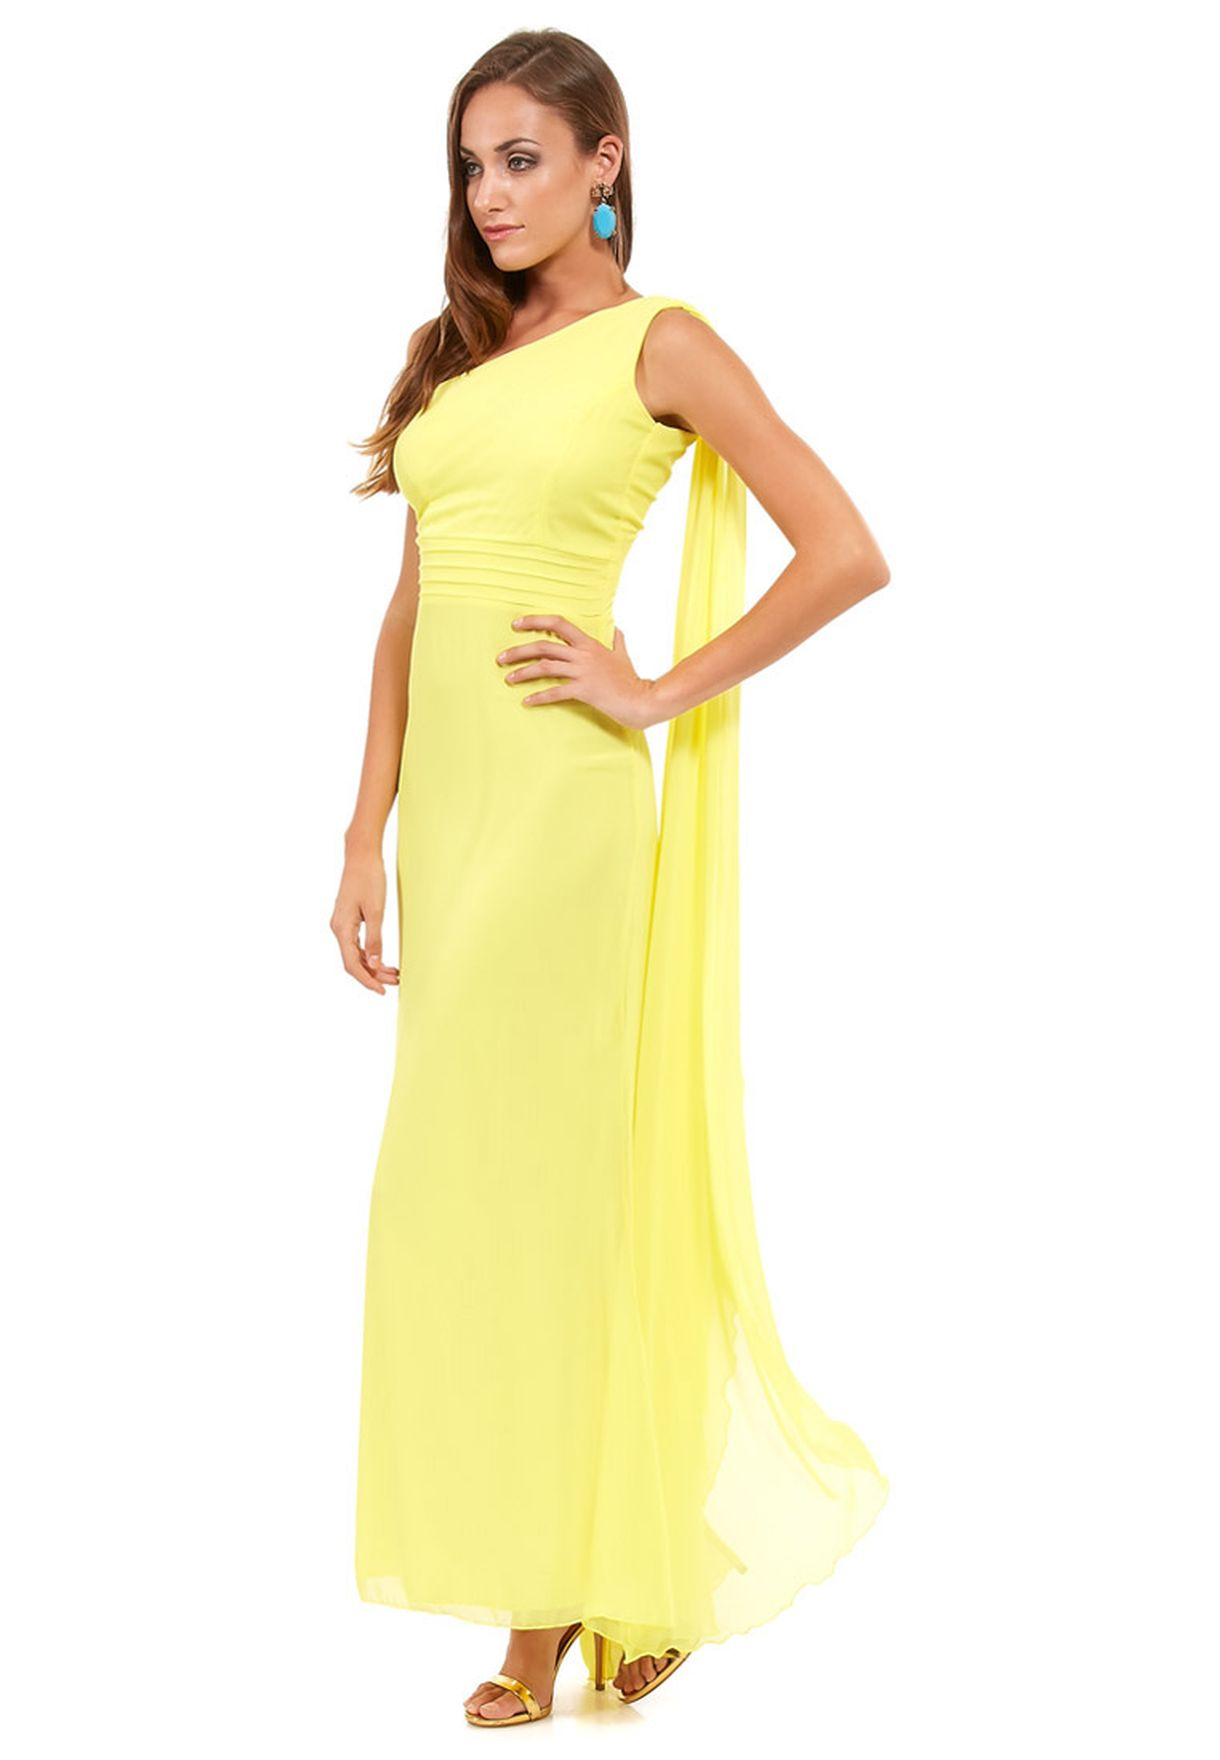 85f51fc8b02 Shop Ella Limited Edition yellow One Shoulder Drape Dress for Women ...